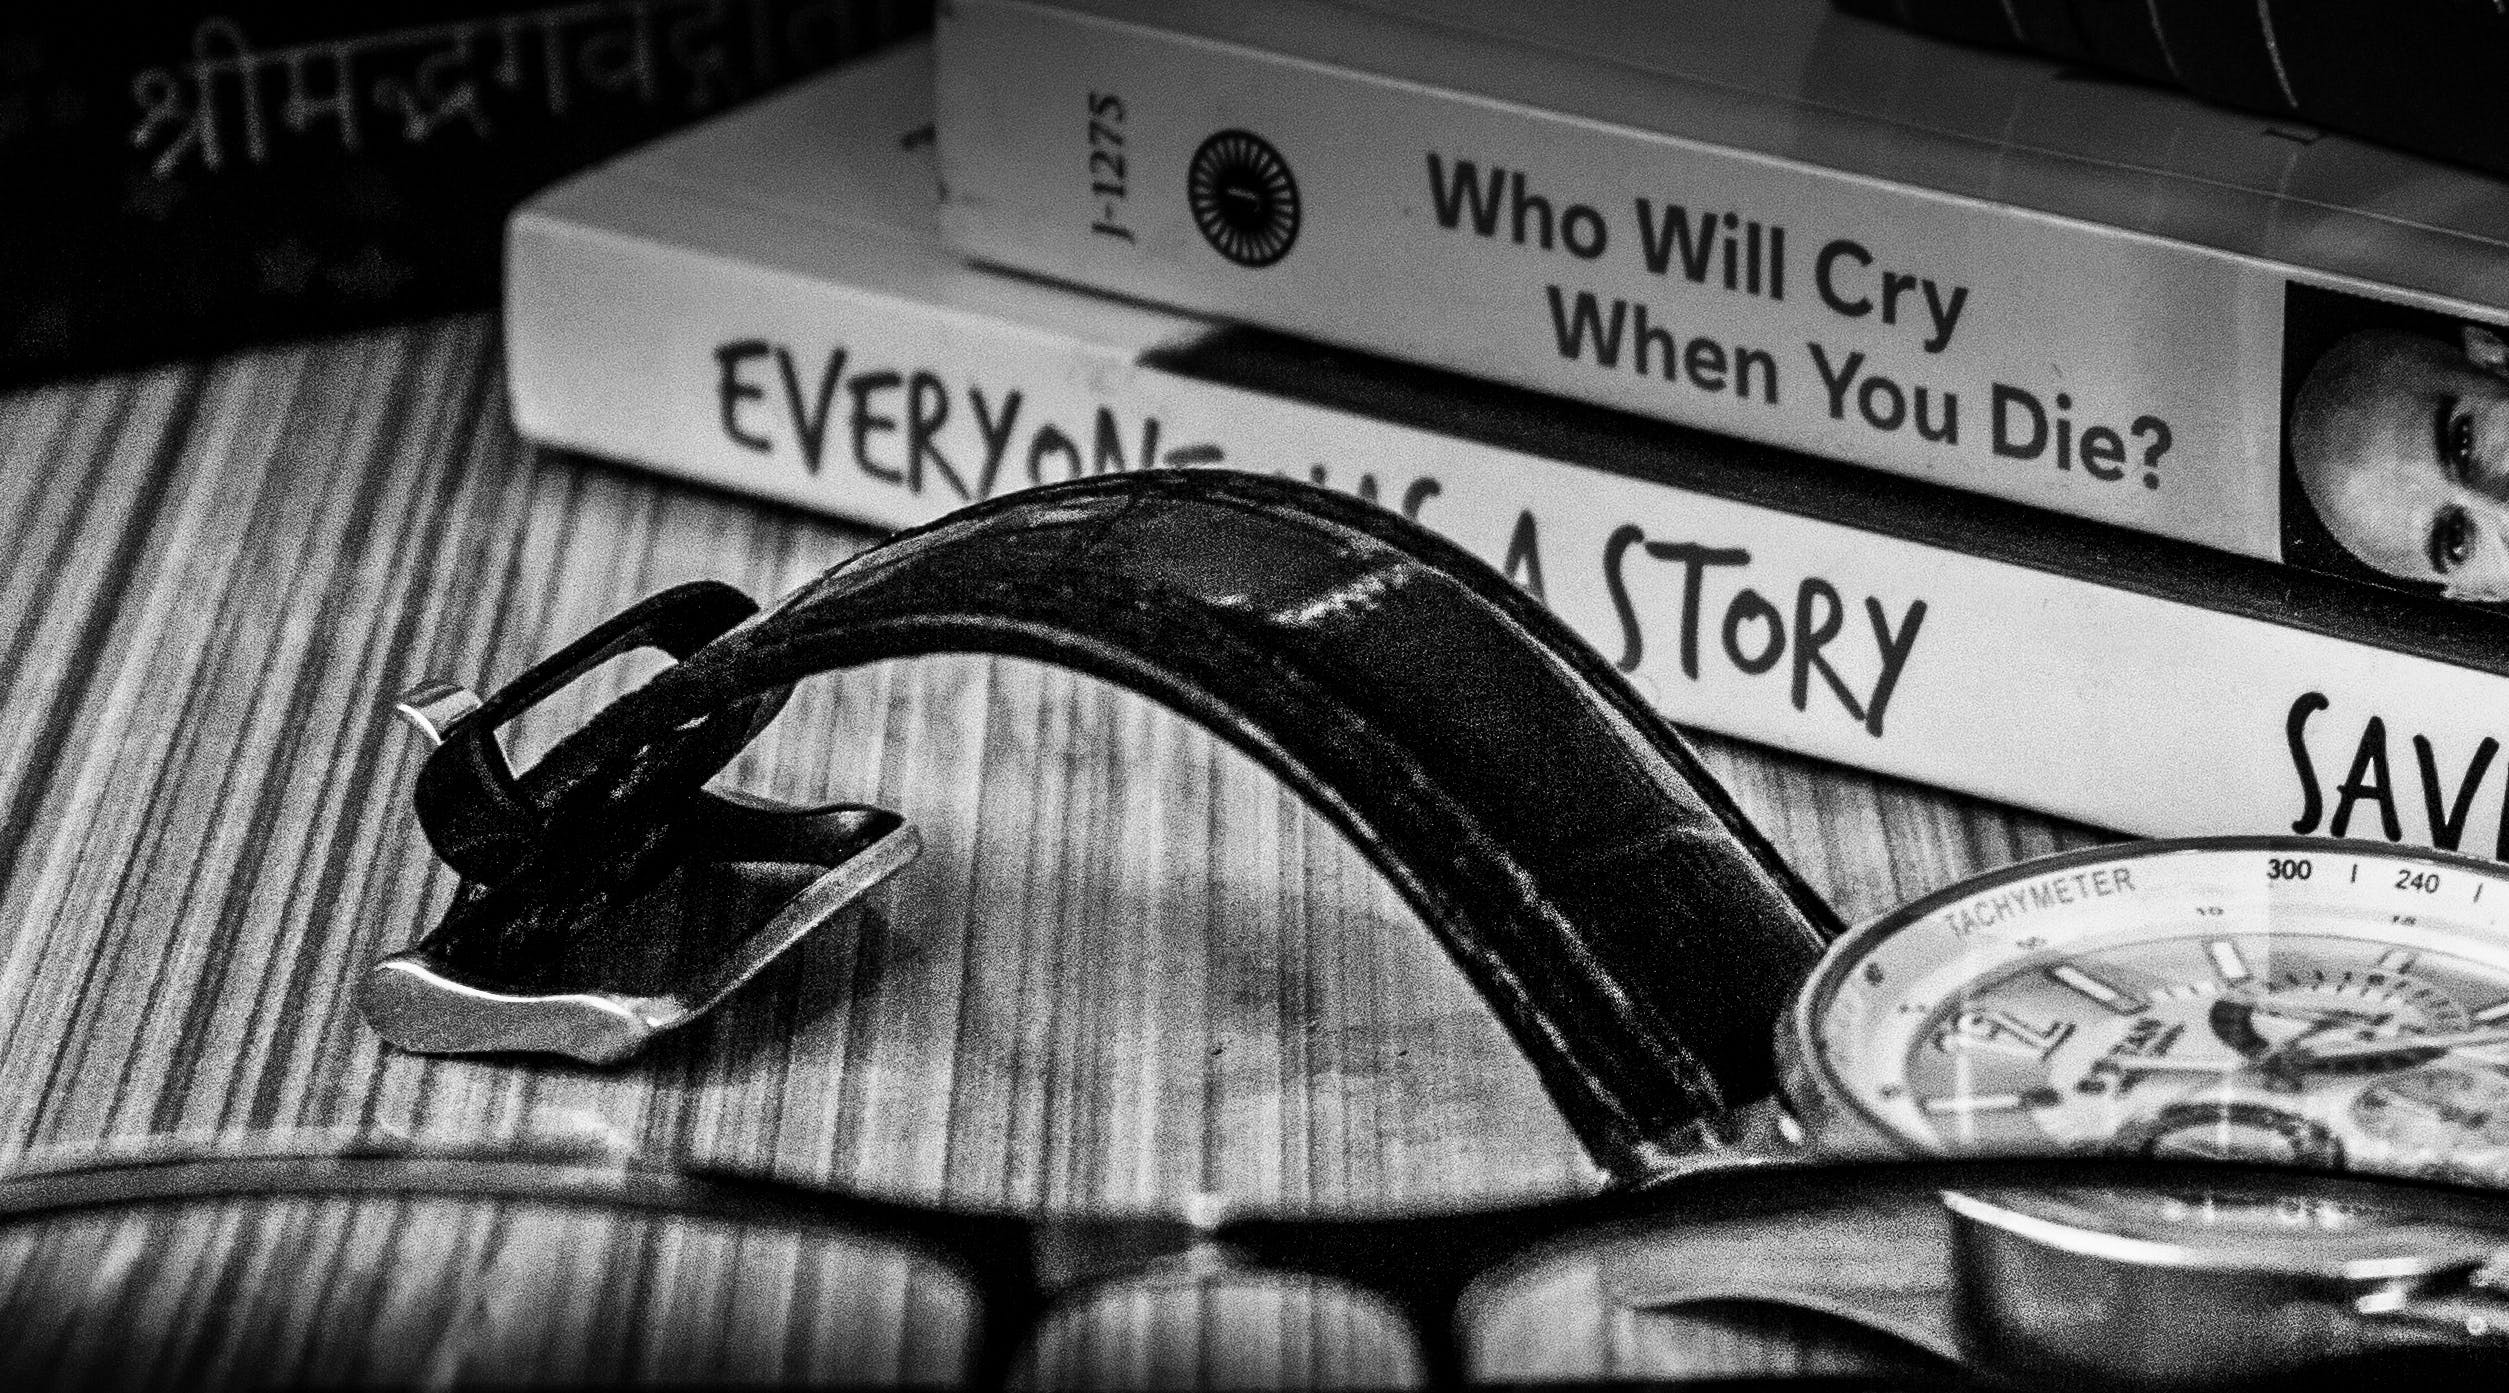 Free stock photo of Analog watch, black and white, books, monochrome